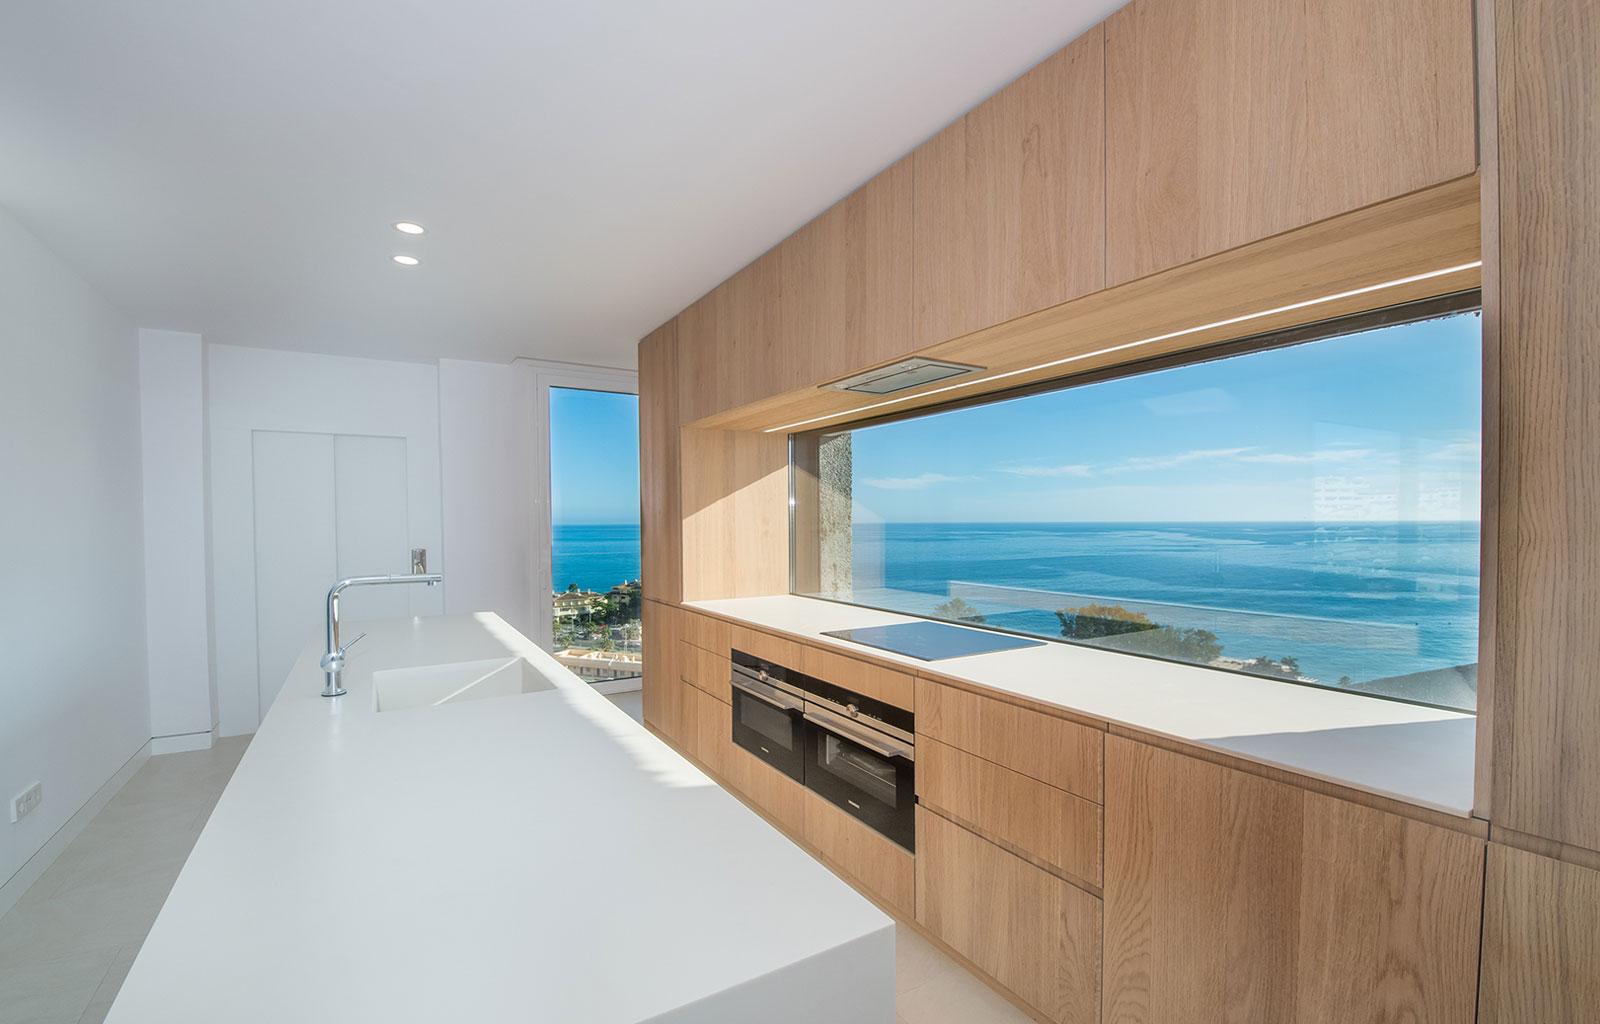 High-Luxury Penthouse over Playa Viborilla